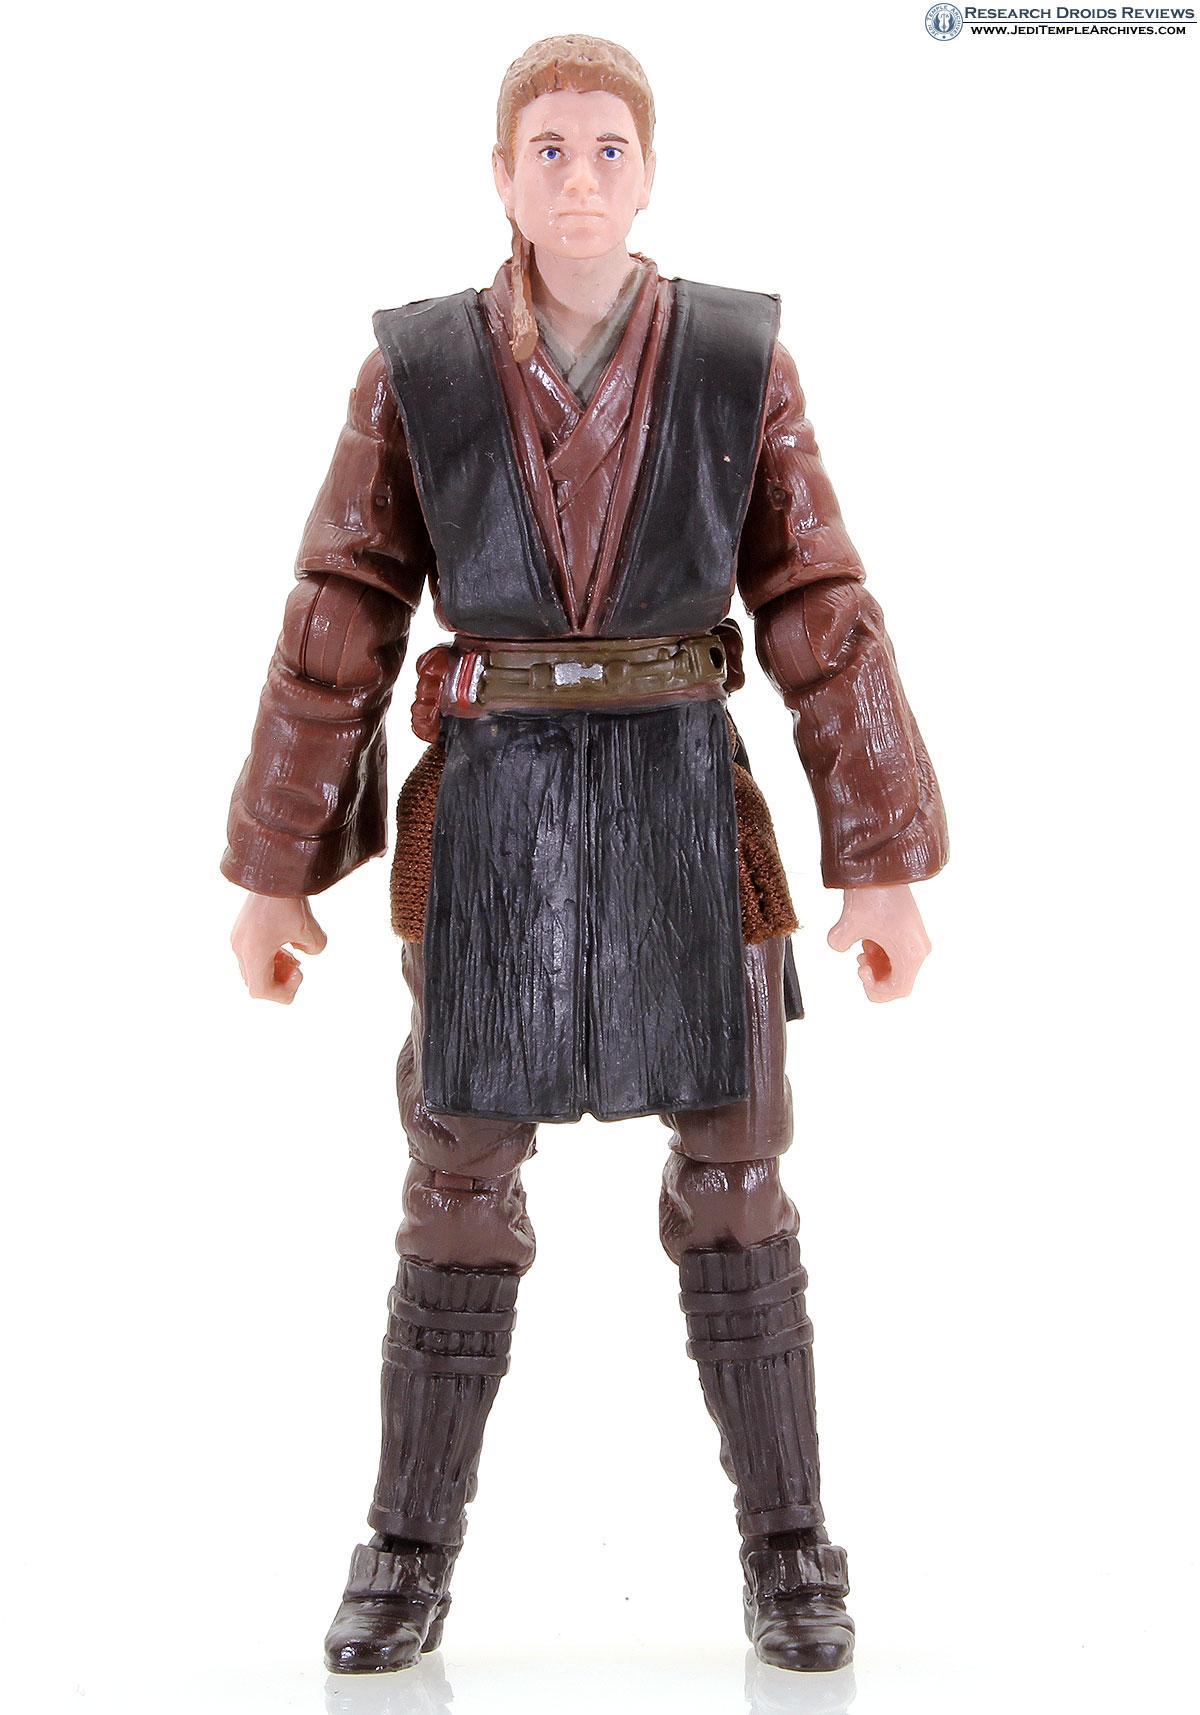 Anakin Skywalker second version light brown hair)